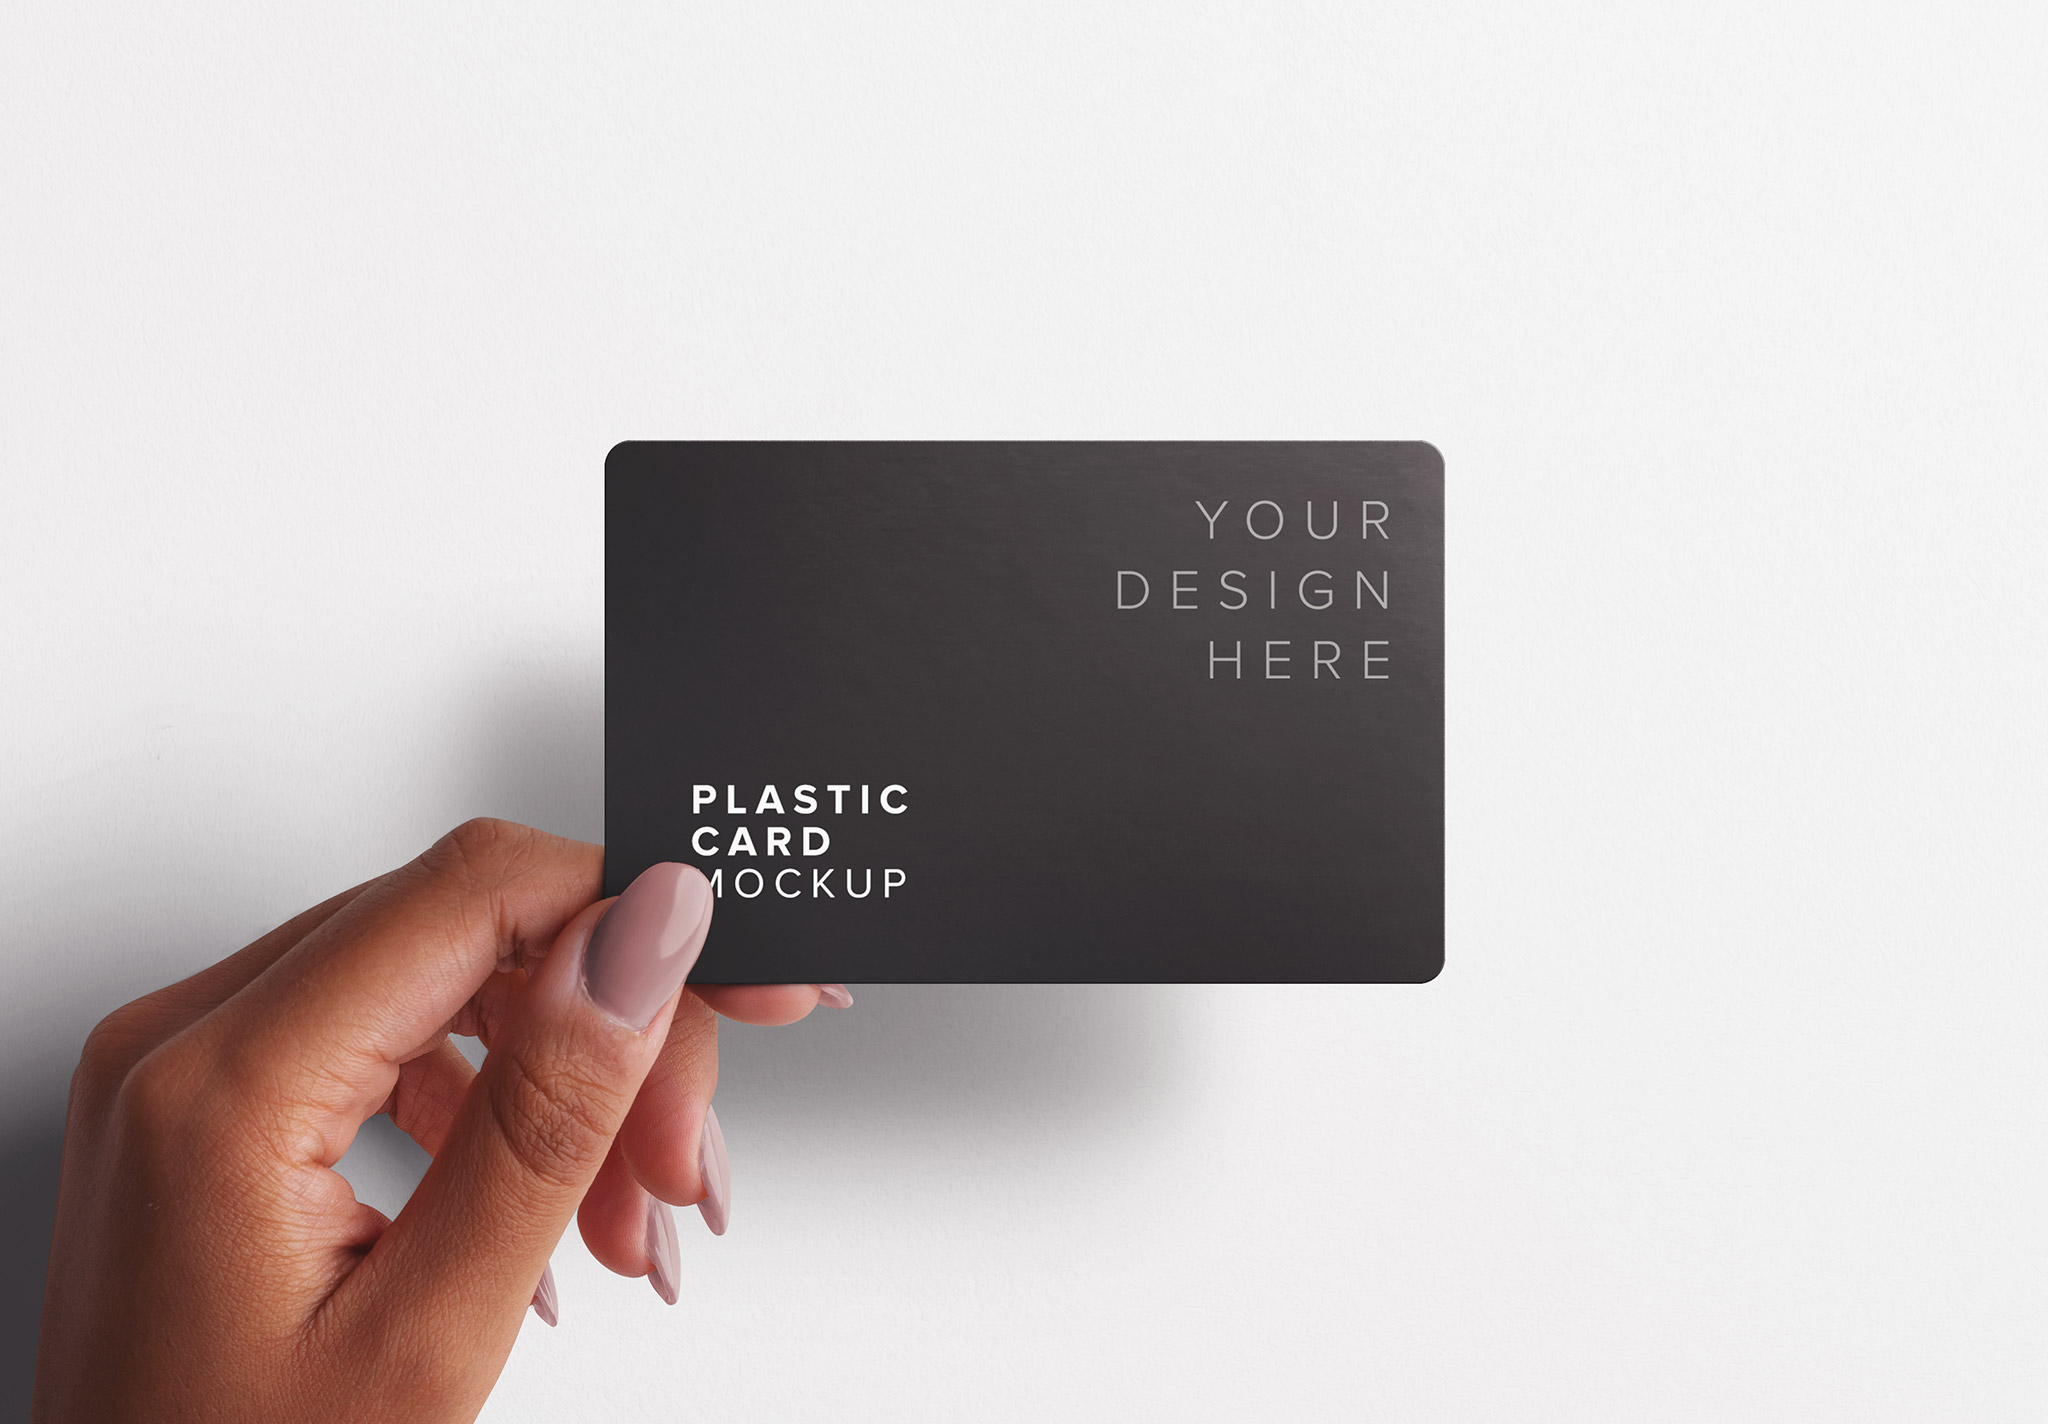 Woman Hand Holding Plastic Card Mockup Thumbnail